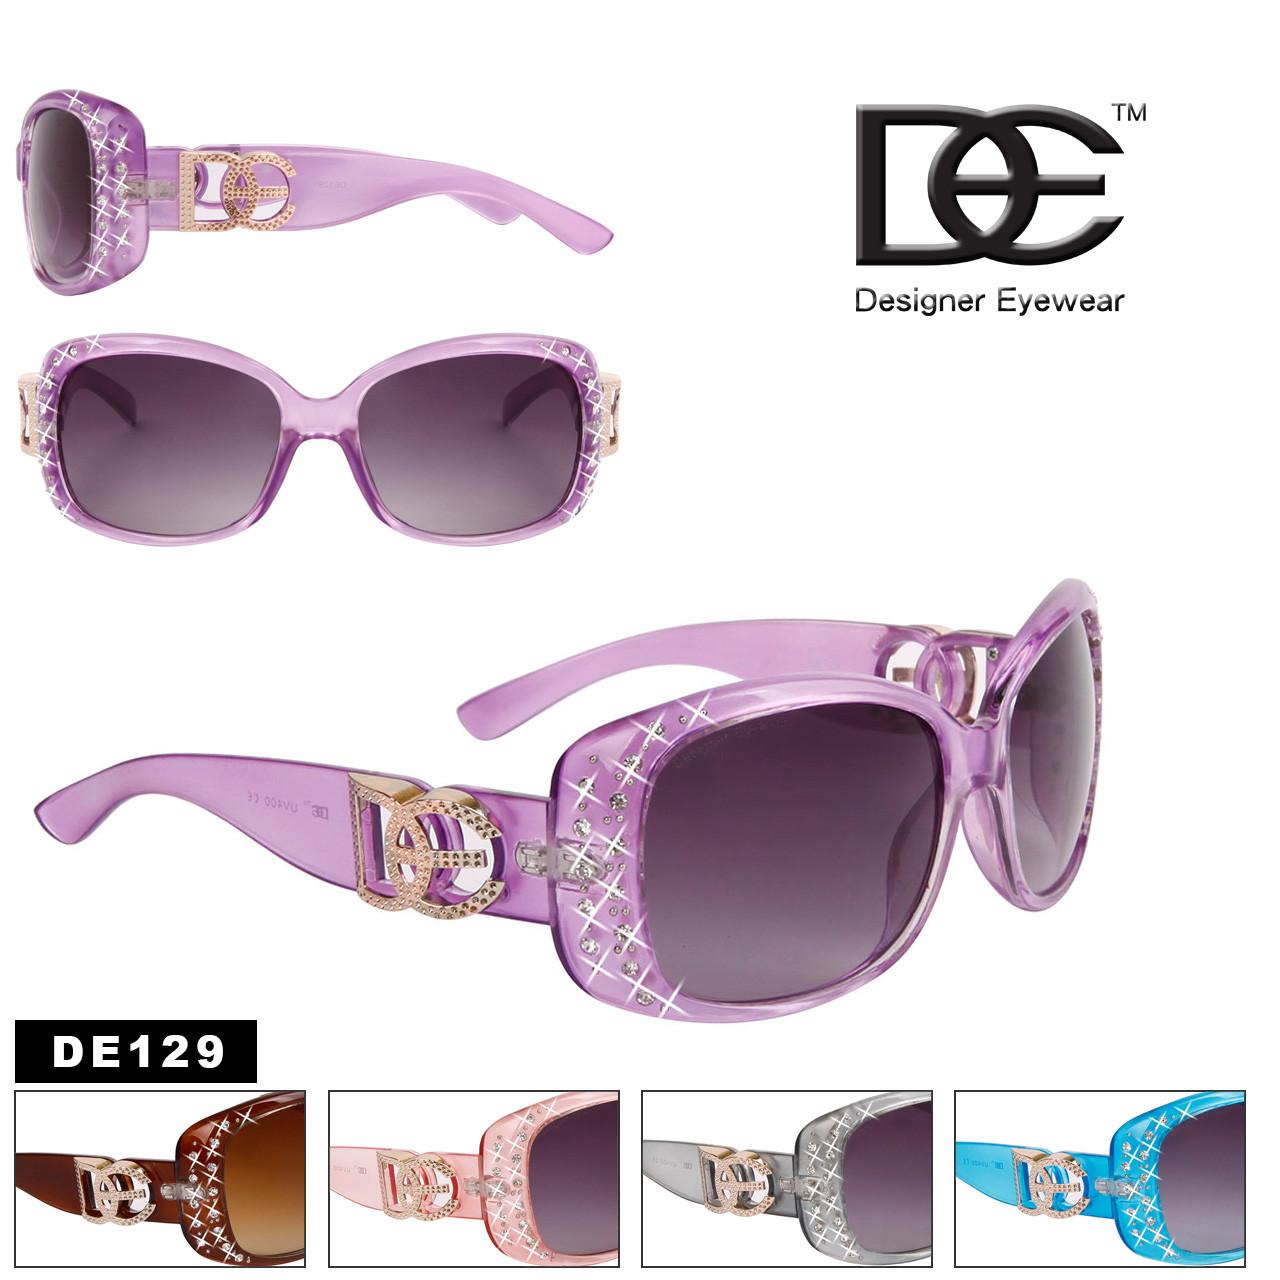 DE™ Designer Eyewear Bulk Fashion Sunglasses - Style #DE129